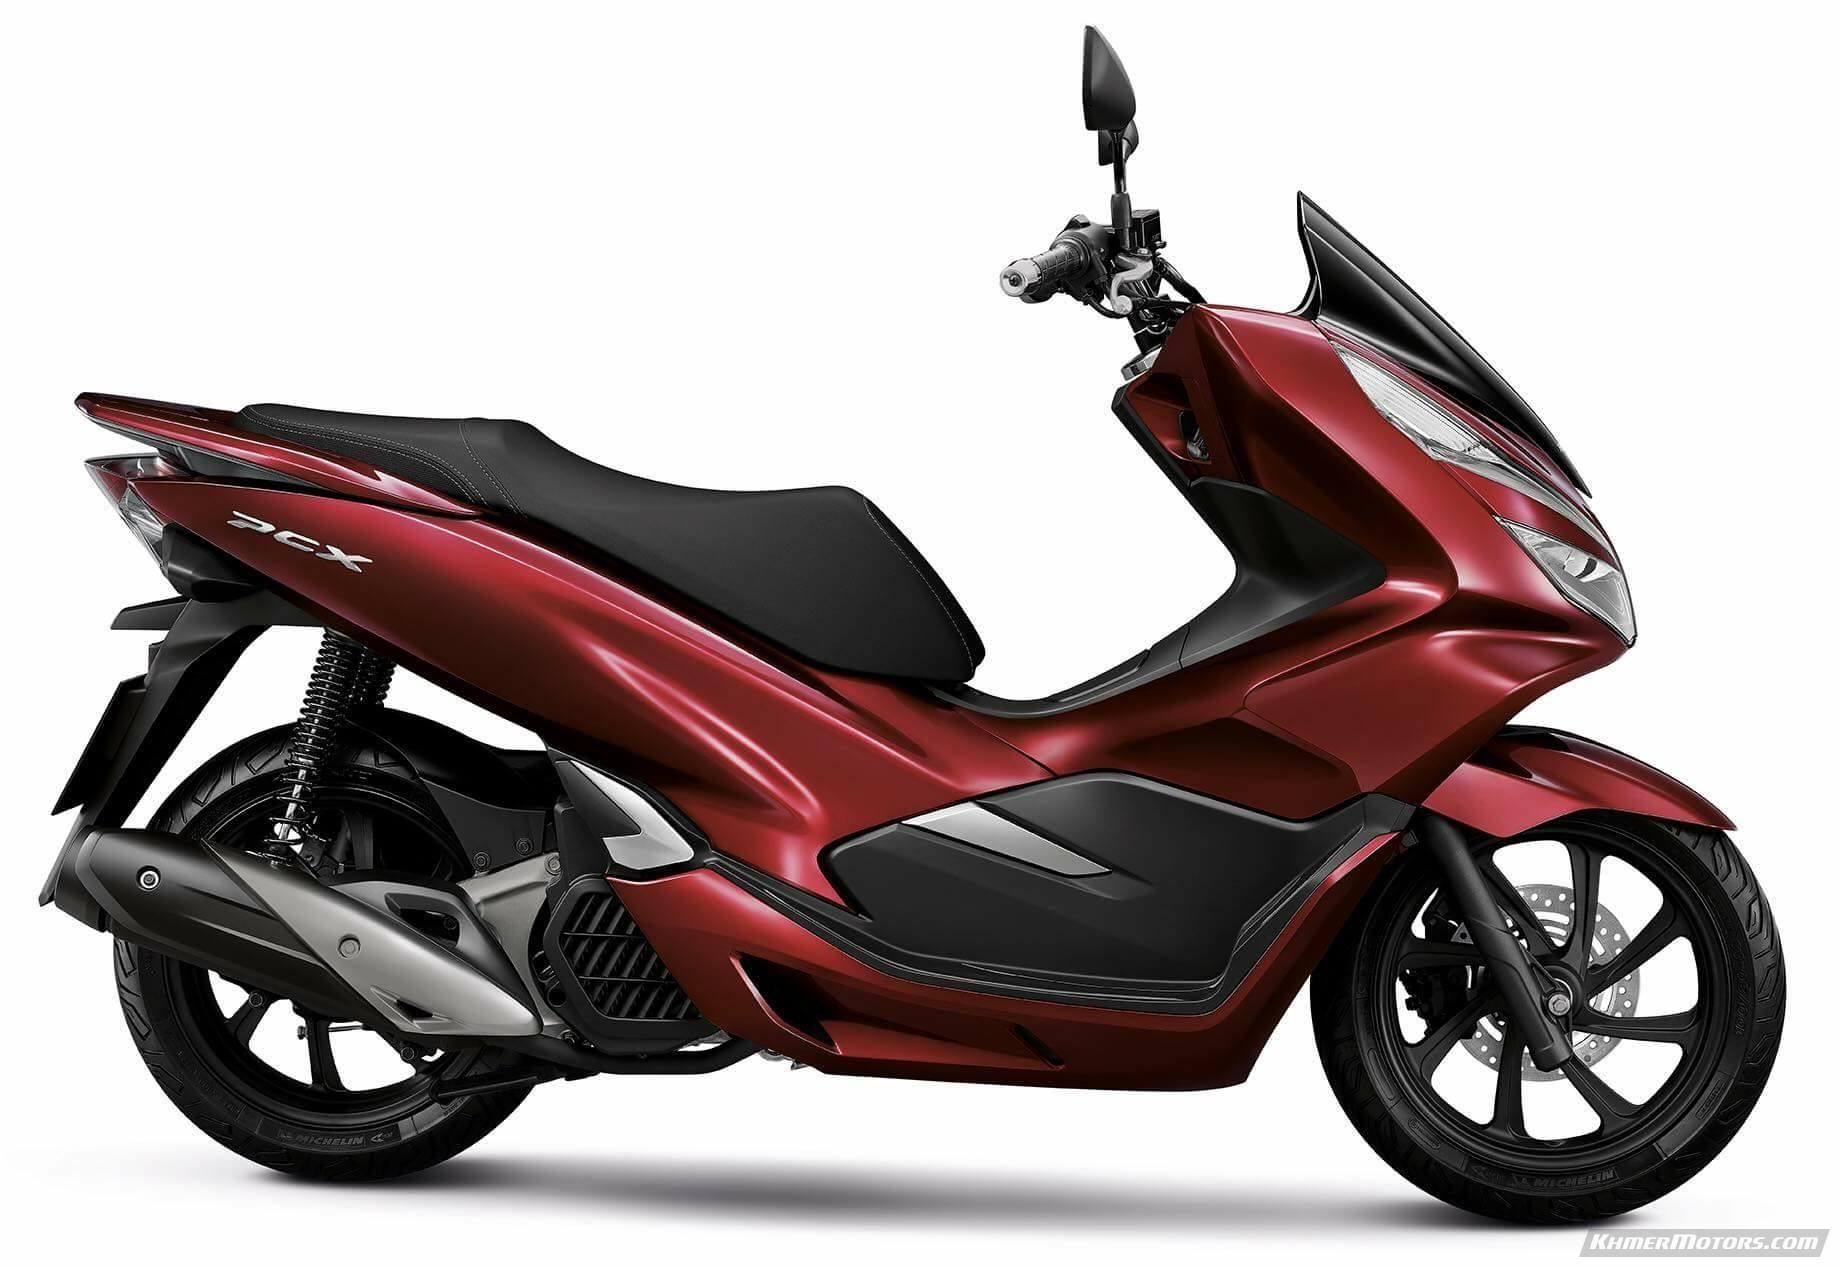 Honda pcx150 2018 price khmer motors for 2017 honda pcx 150